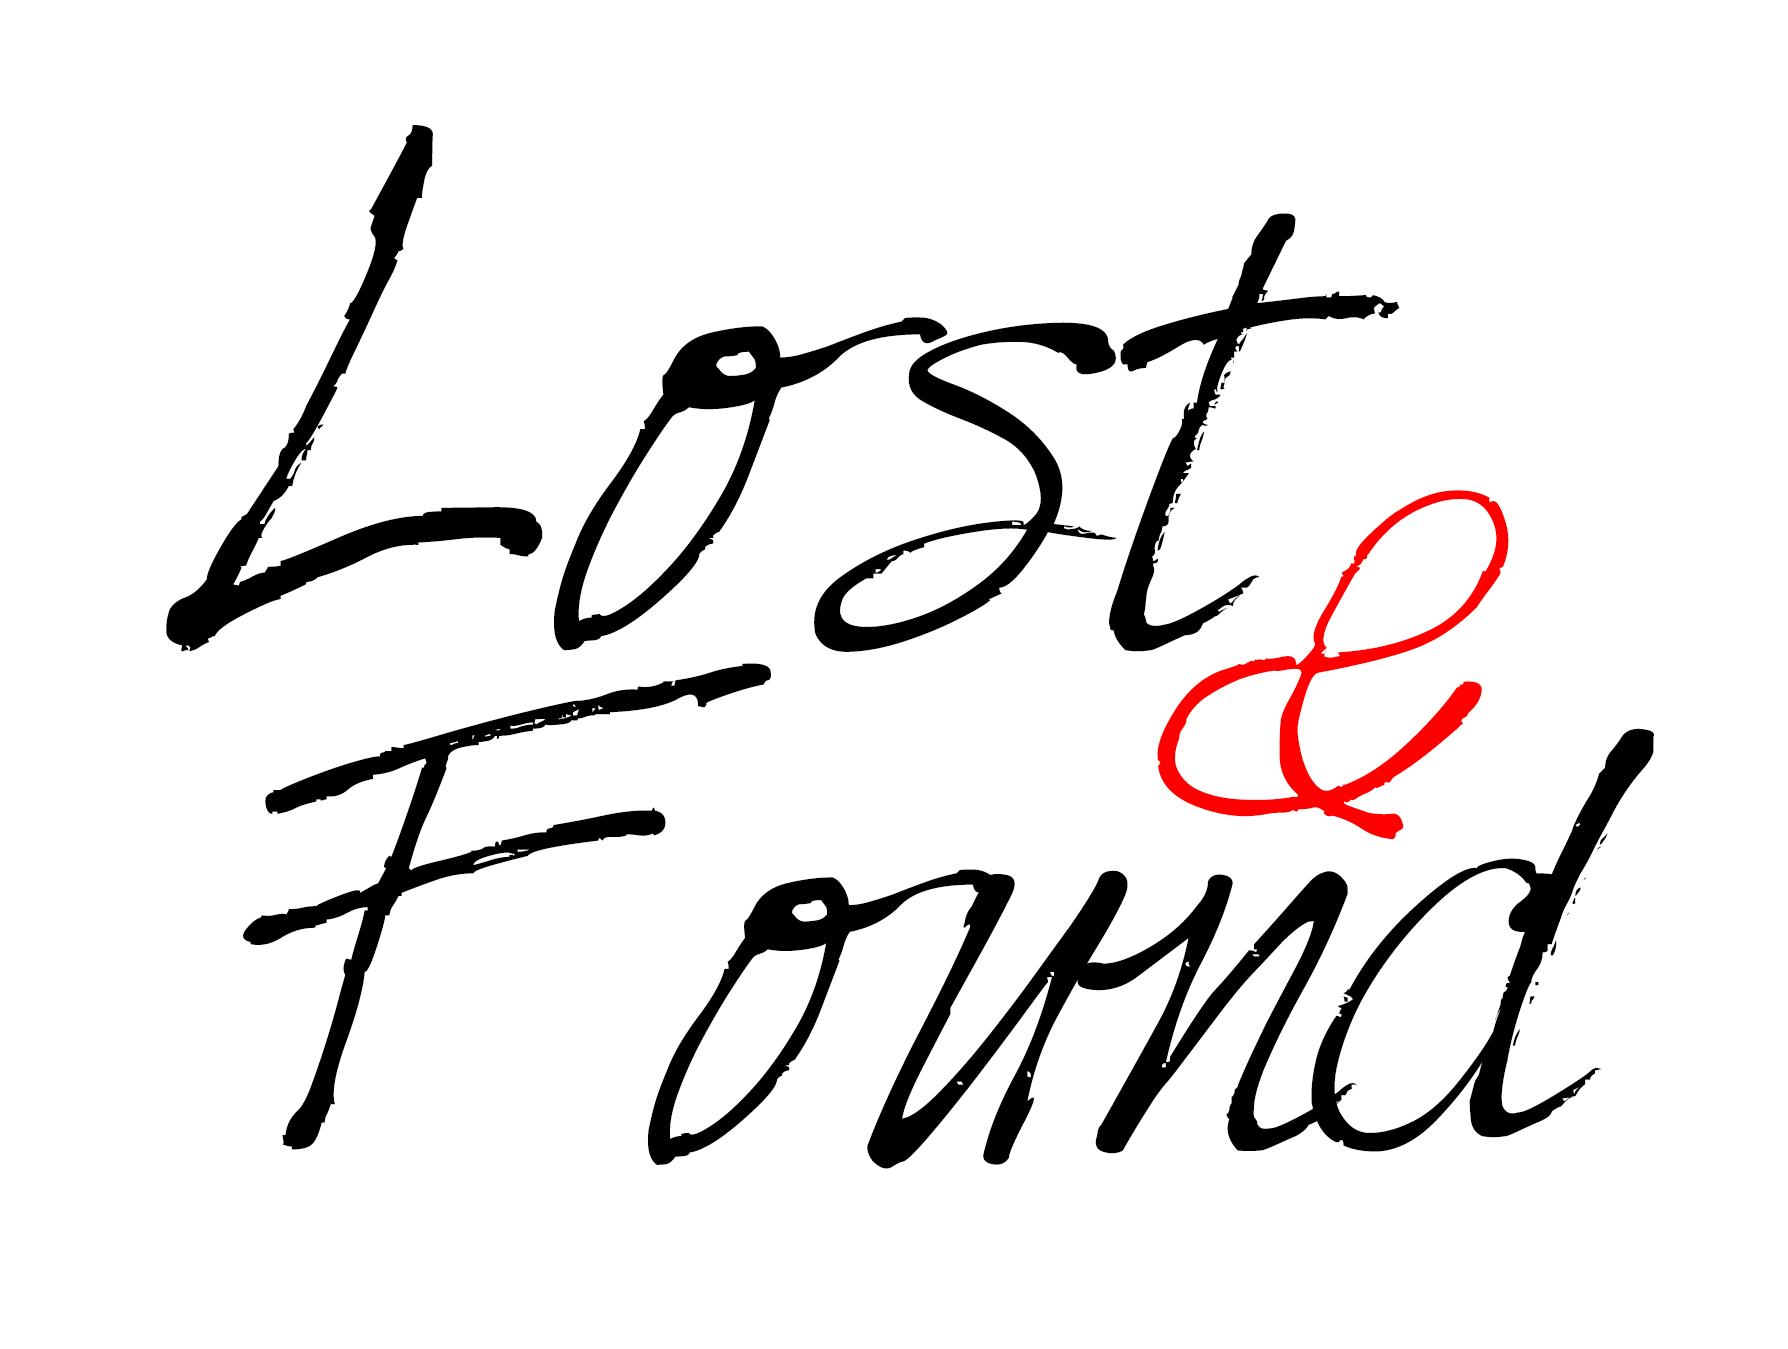 Lost: Cat